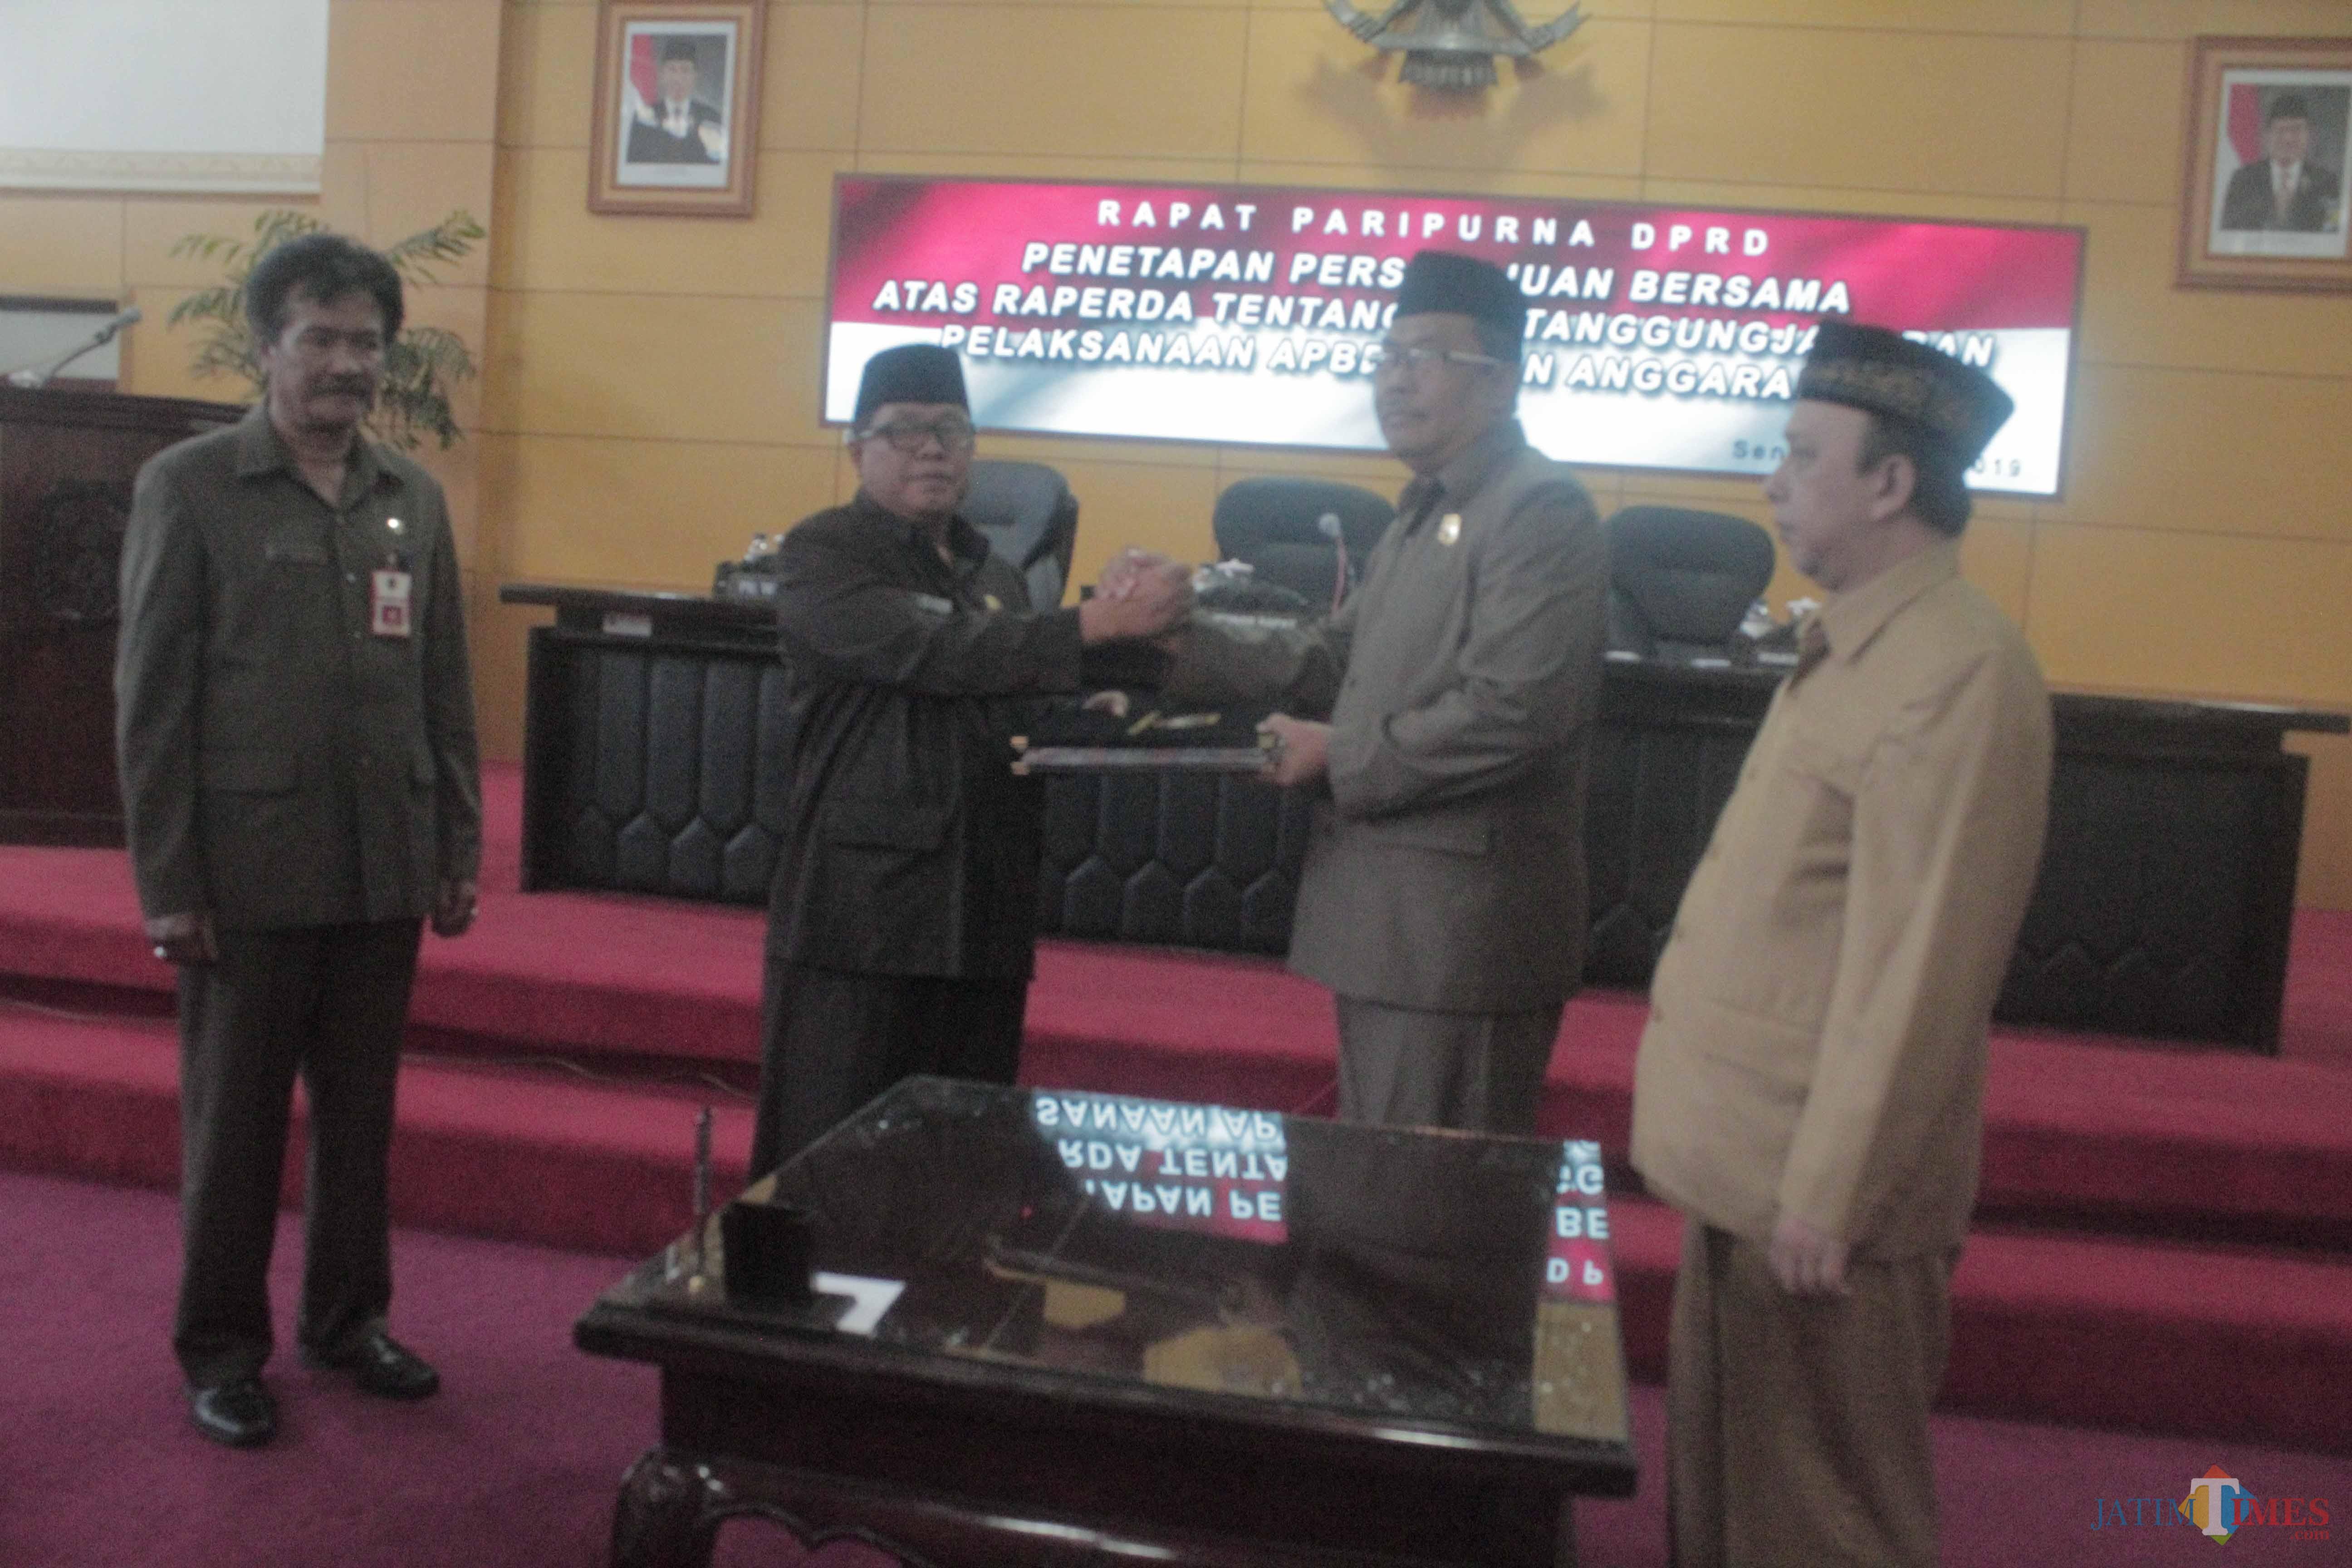 Wakil Ketua DPRD Kota Blitar Slamet menyerahkan dokumen Perda APBD 2018 kepada Plt Wali Kota Blitar Santoso.(Foto : Aunur Rofiq/BlitarTIMES)